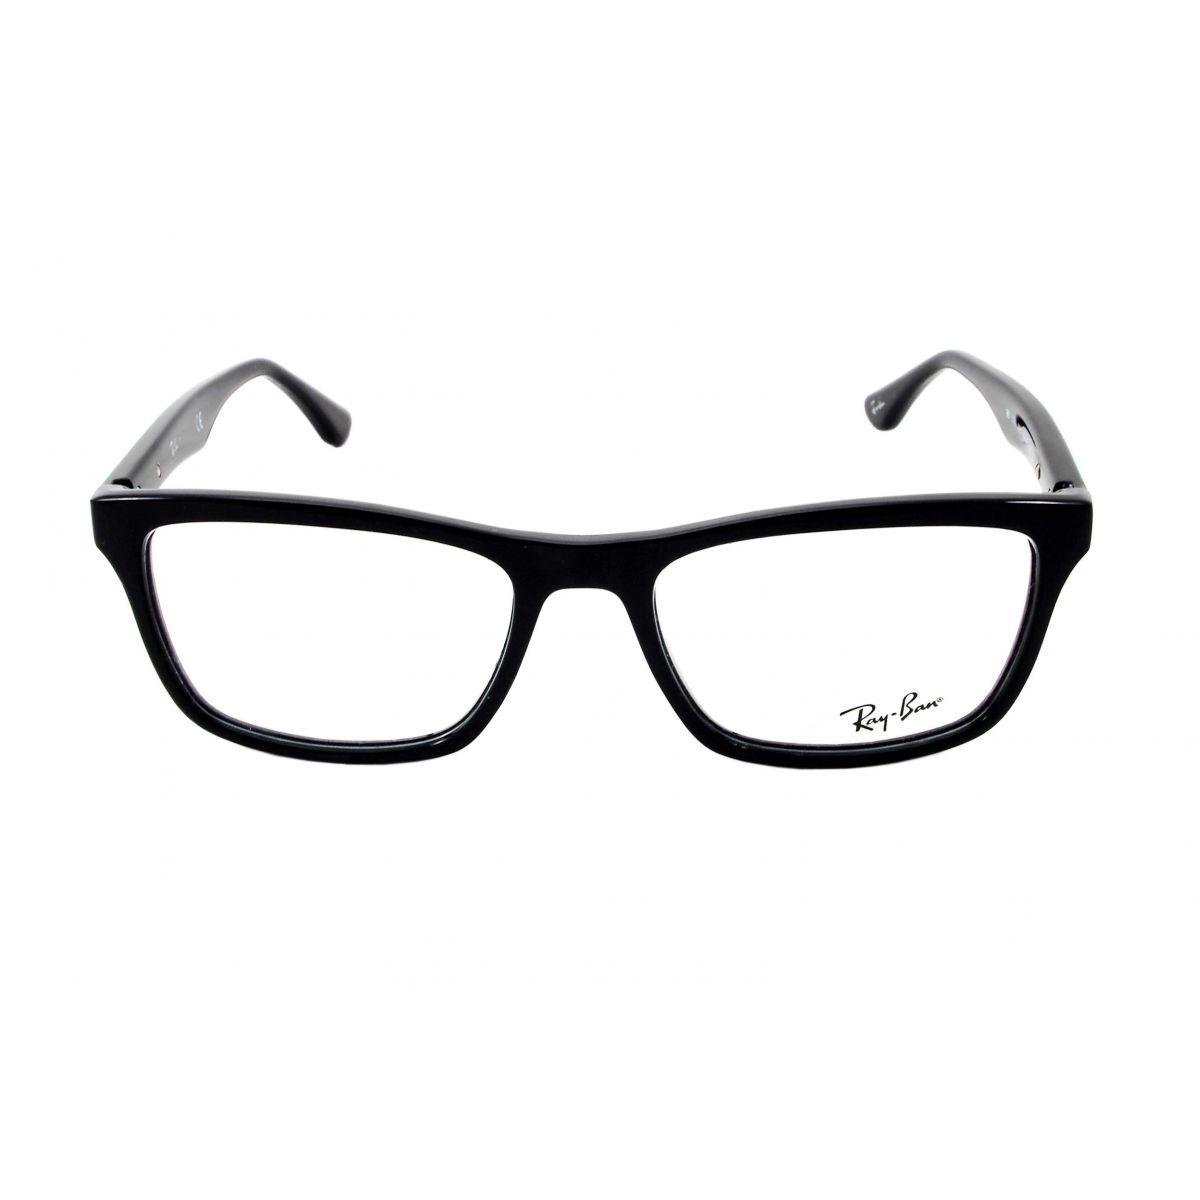 b9f3027c7 óculos Ray Ban Wayfarer Preto De Grau « One More Soul